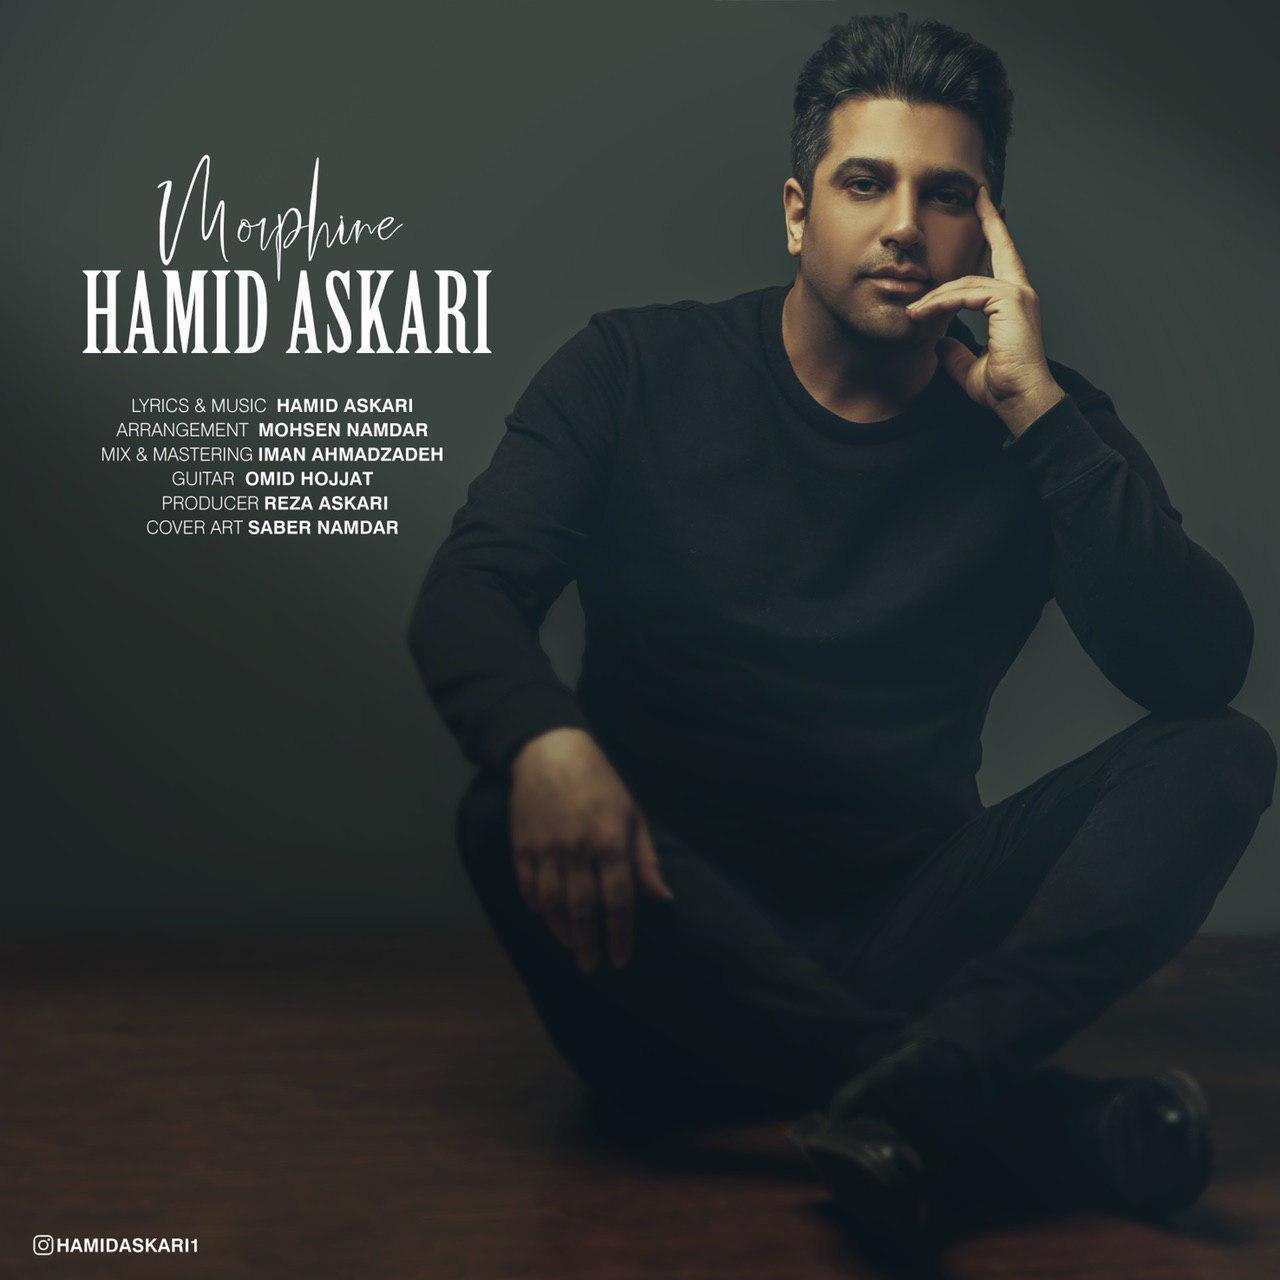 Hamid Askari - Morphine - دانلود آهنگ حمید عسکری به نام مرفین